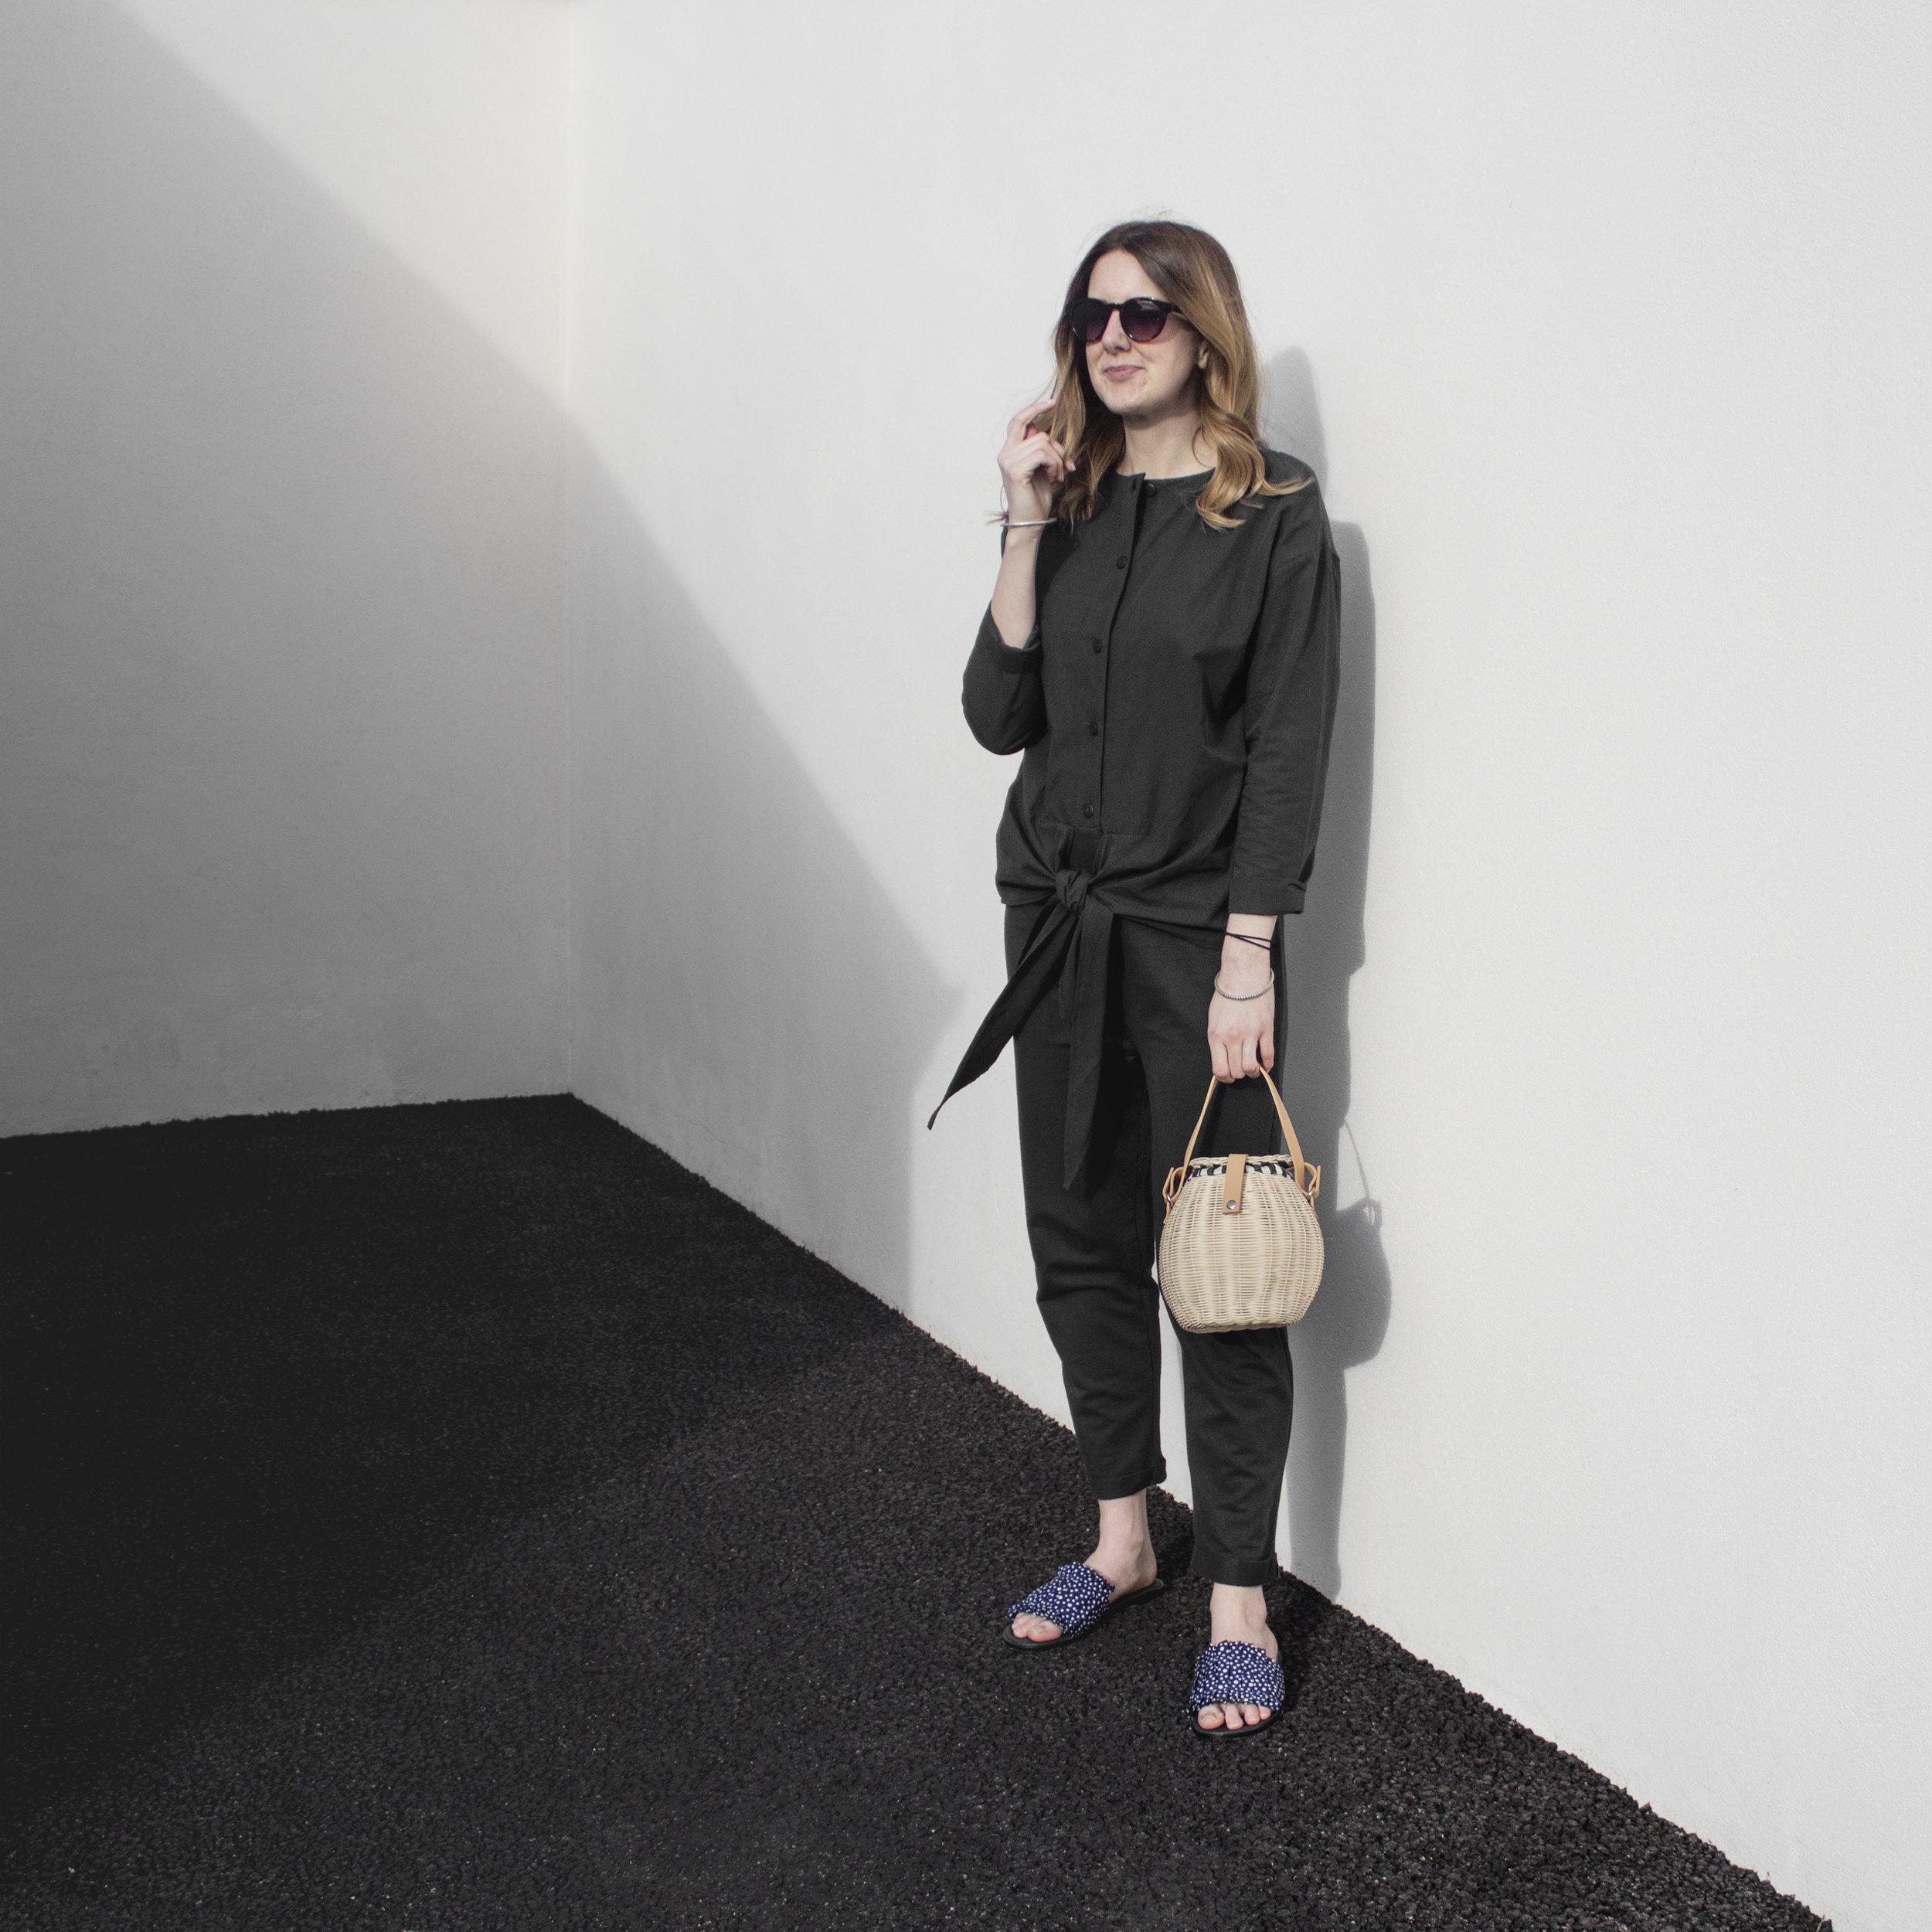 Baskets ss17 nicole davidson fashion buying